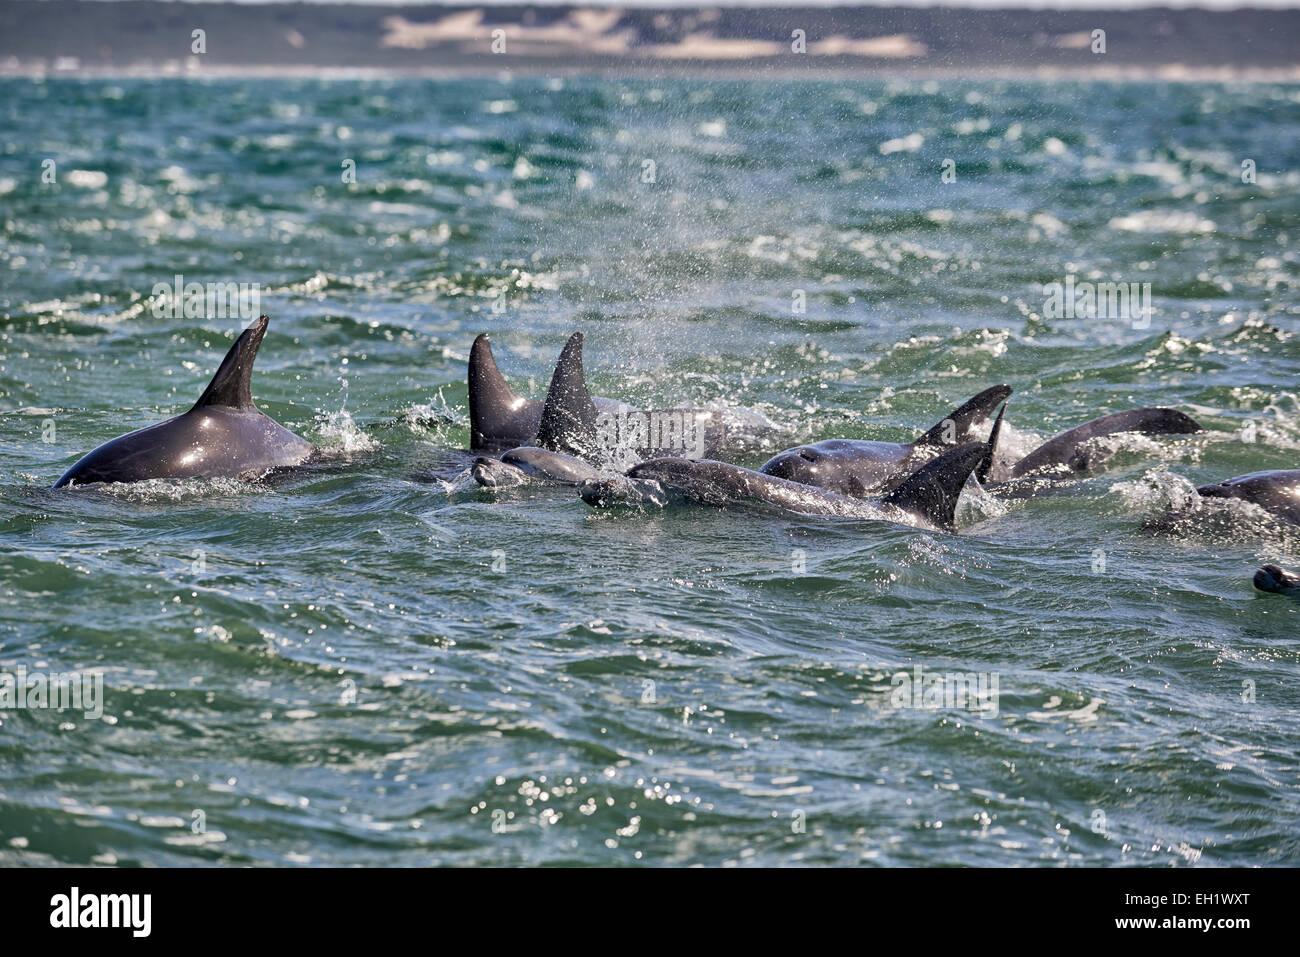 herd of hunting bottlenose dolphin (Tursiops truncatus), Eastern Cape, South Africa - Stock Image